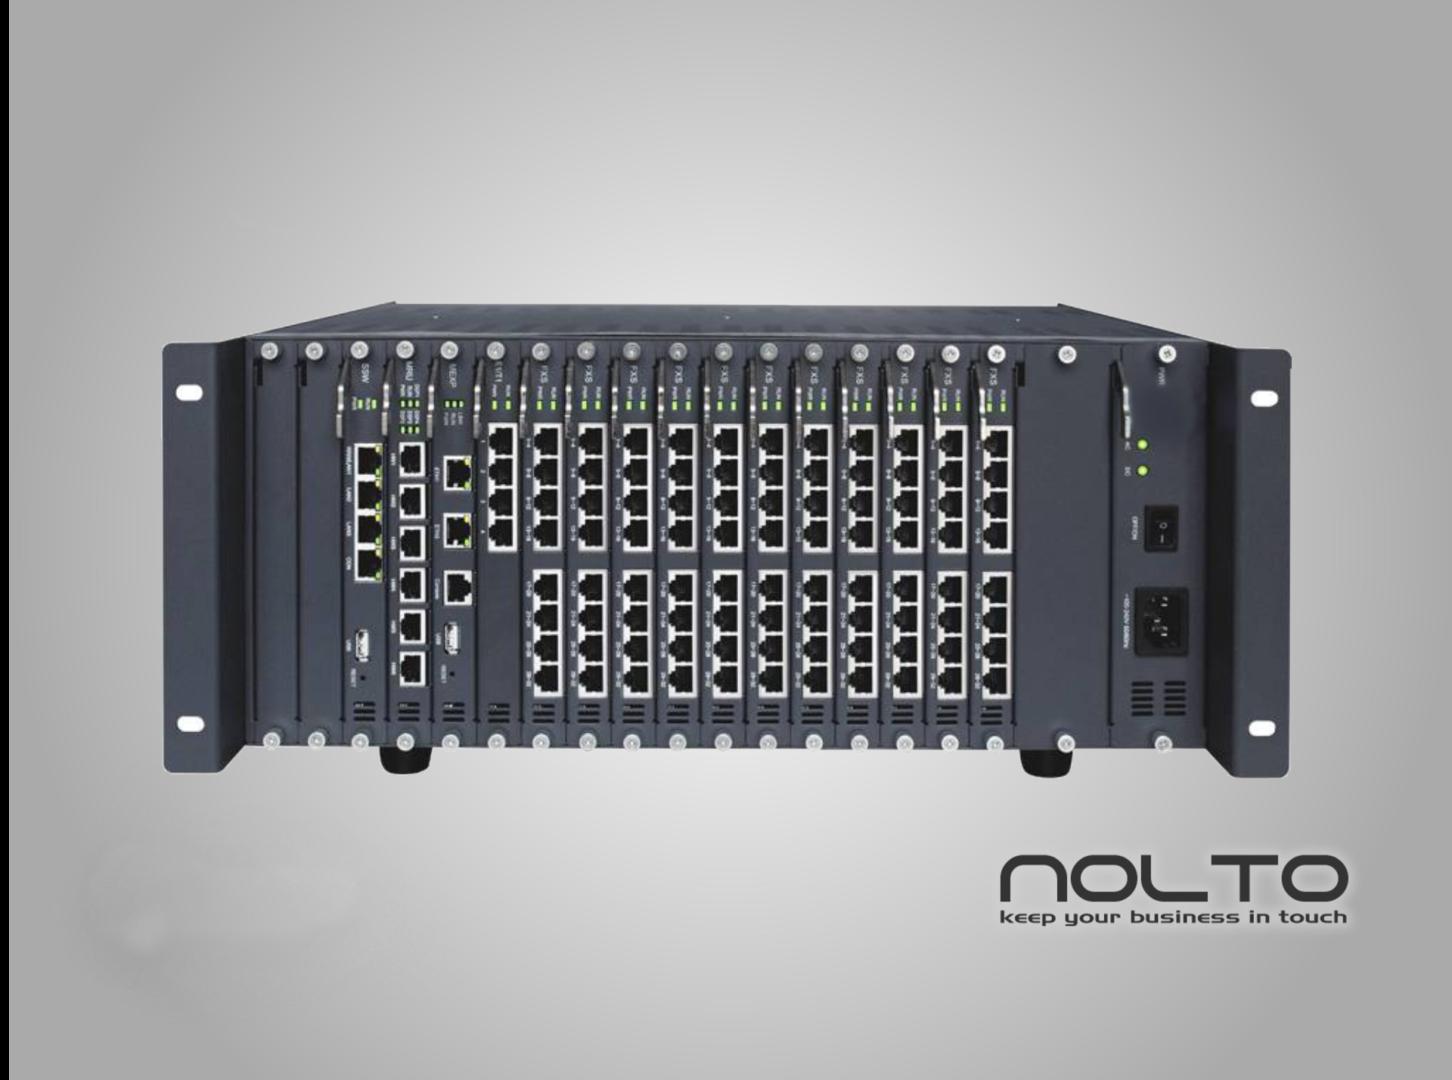 nolto-pbx8000-yuksek-kapasiteli-telefon-santrali-2